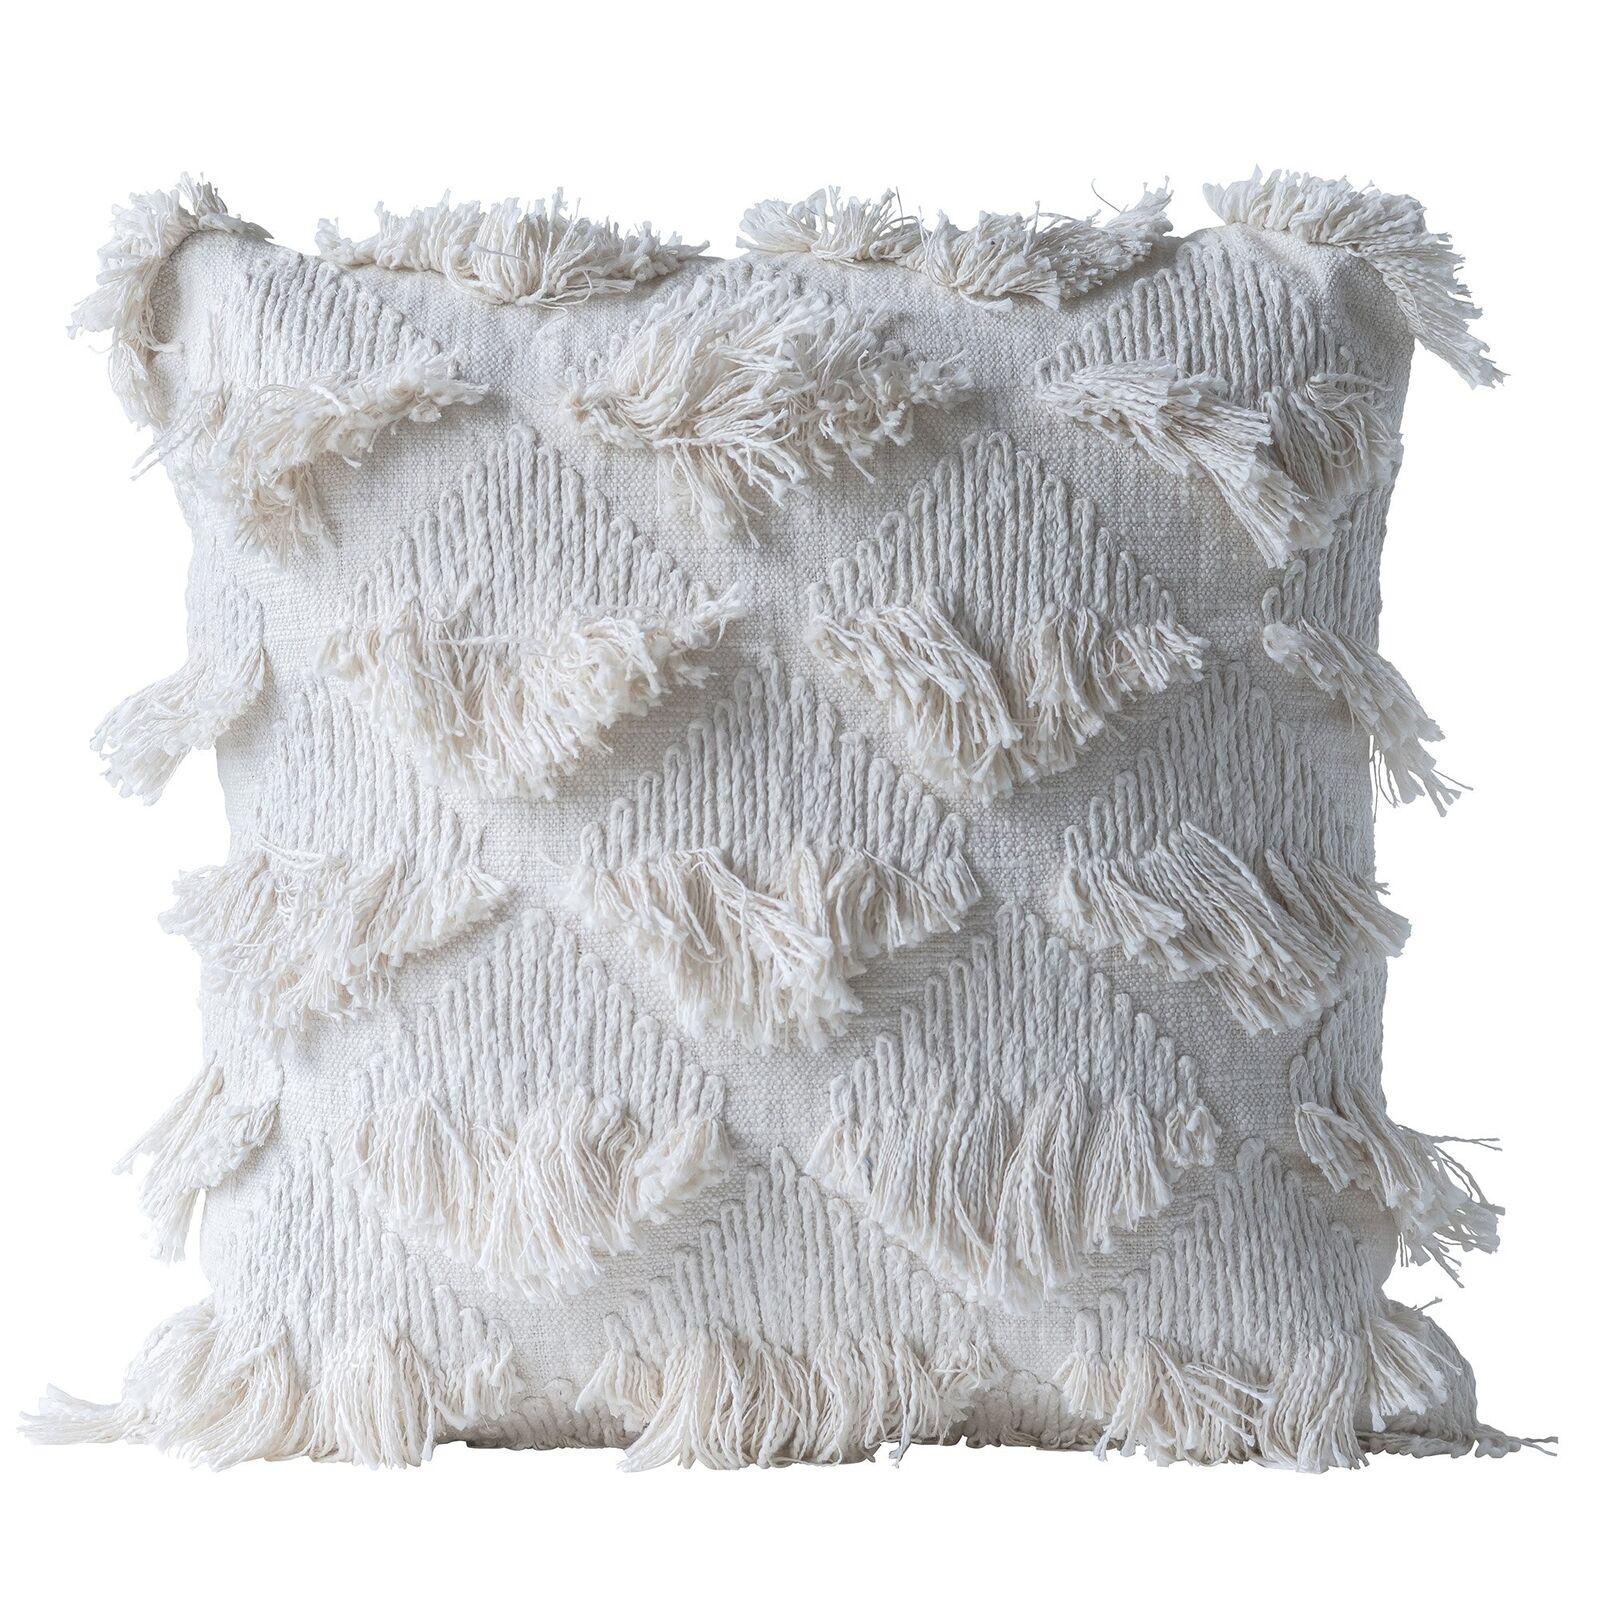 Bloomingville Kissen Boho Fransen in Weiß, L55xB55 cm